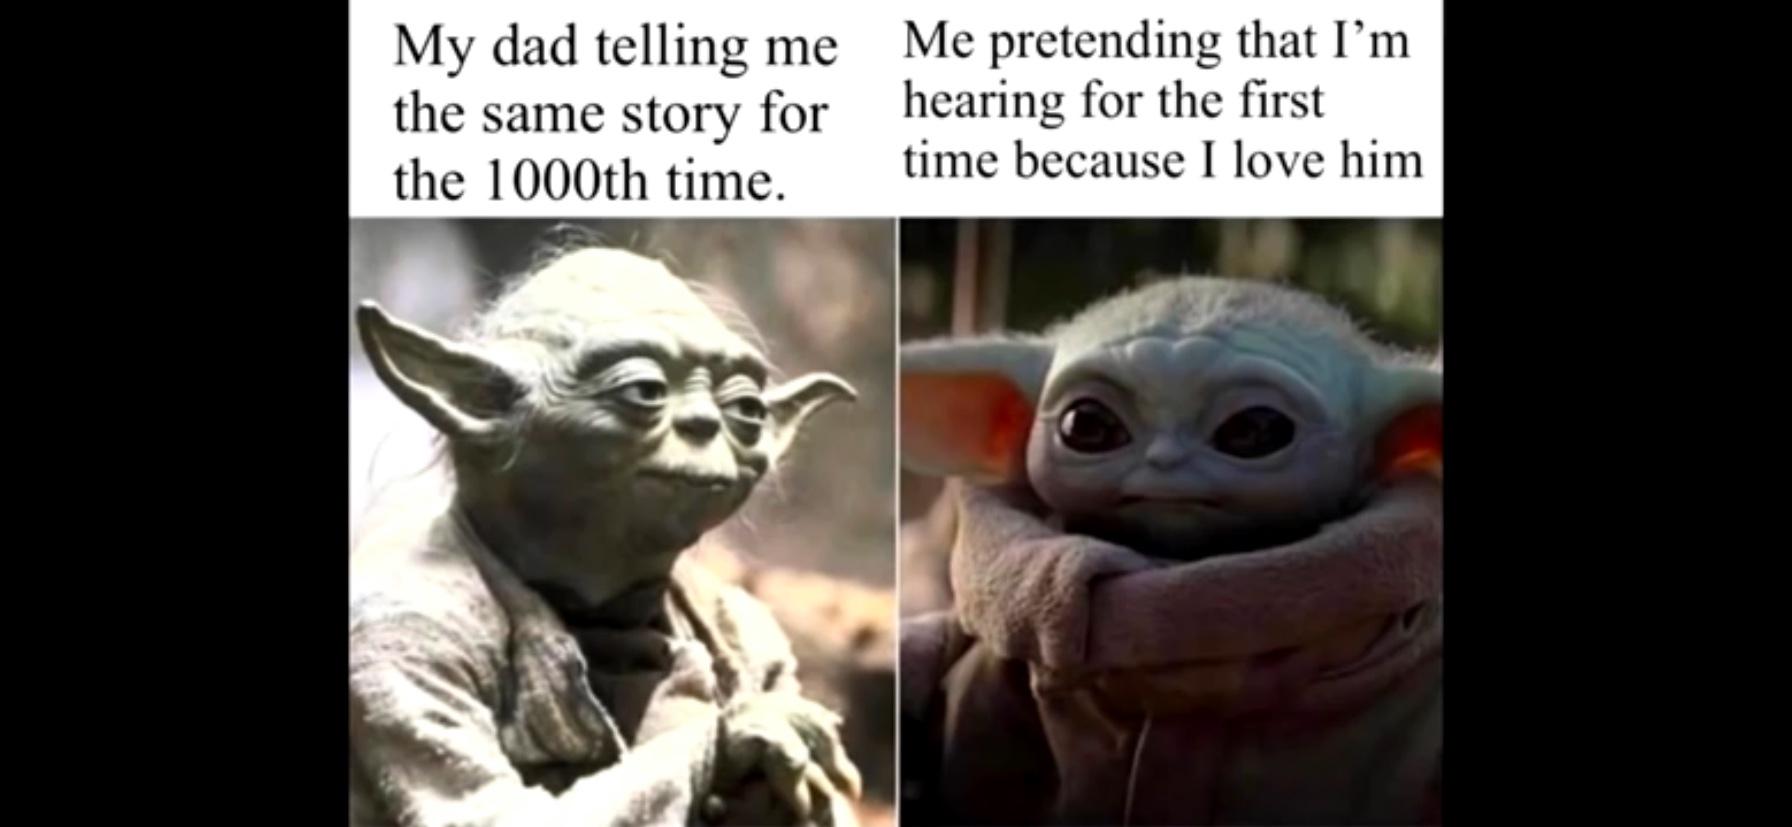 I wish I had a dad but i am a watermelon - meme